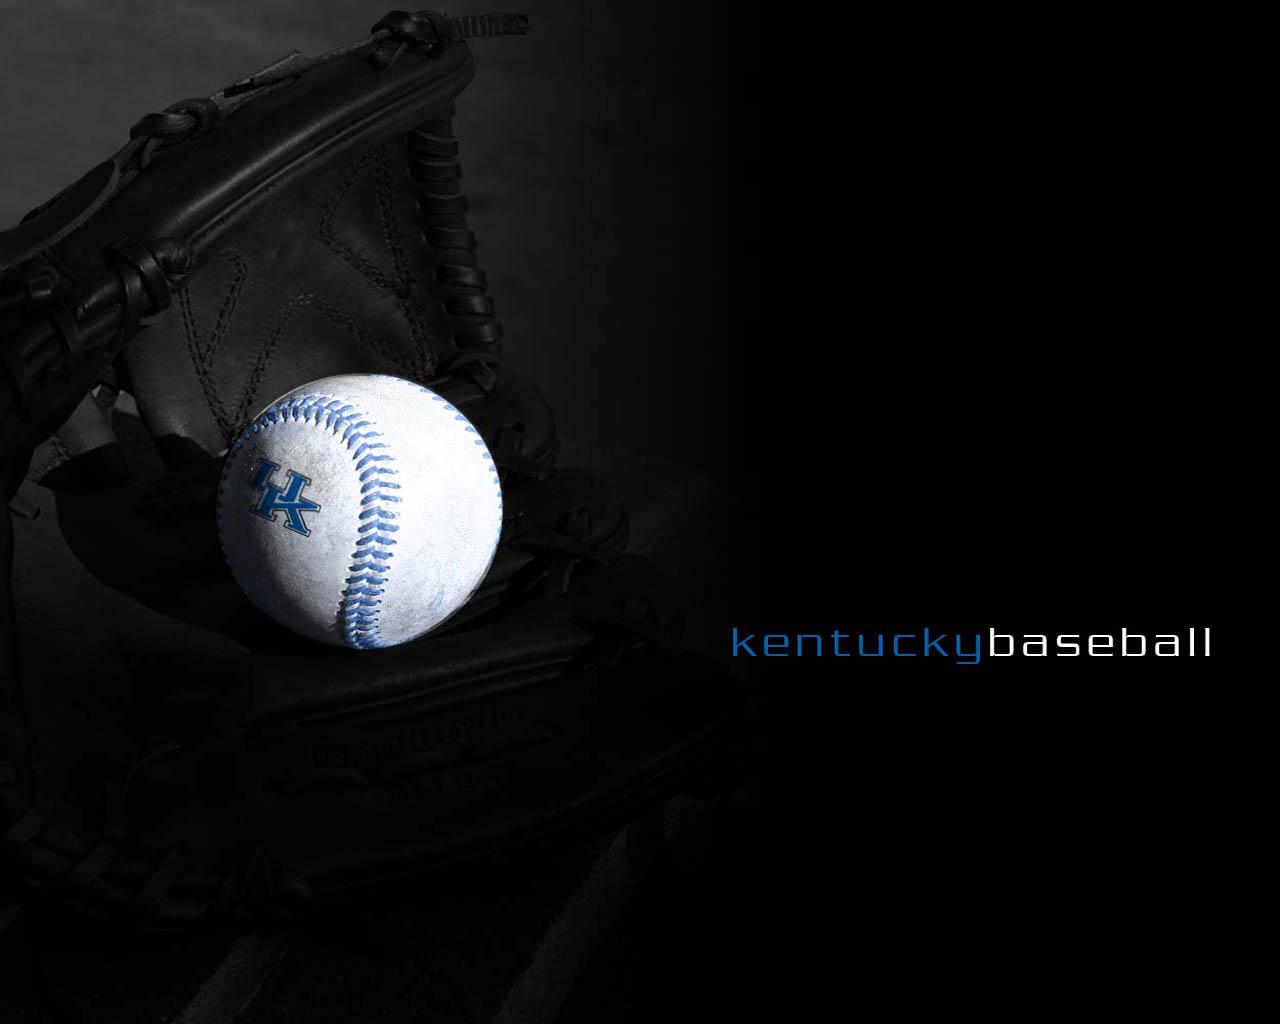 Baseball wallpapers xc 4 1280x1024